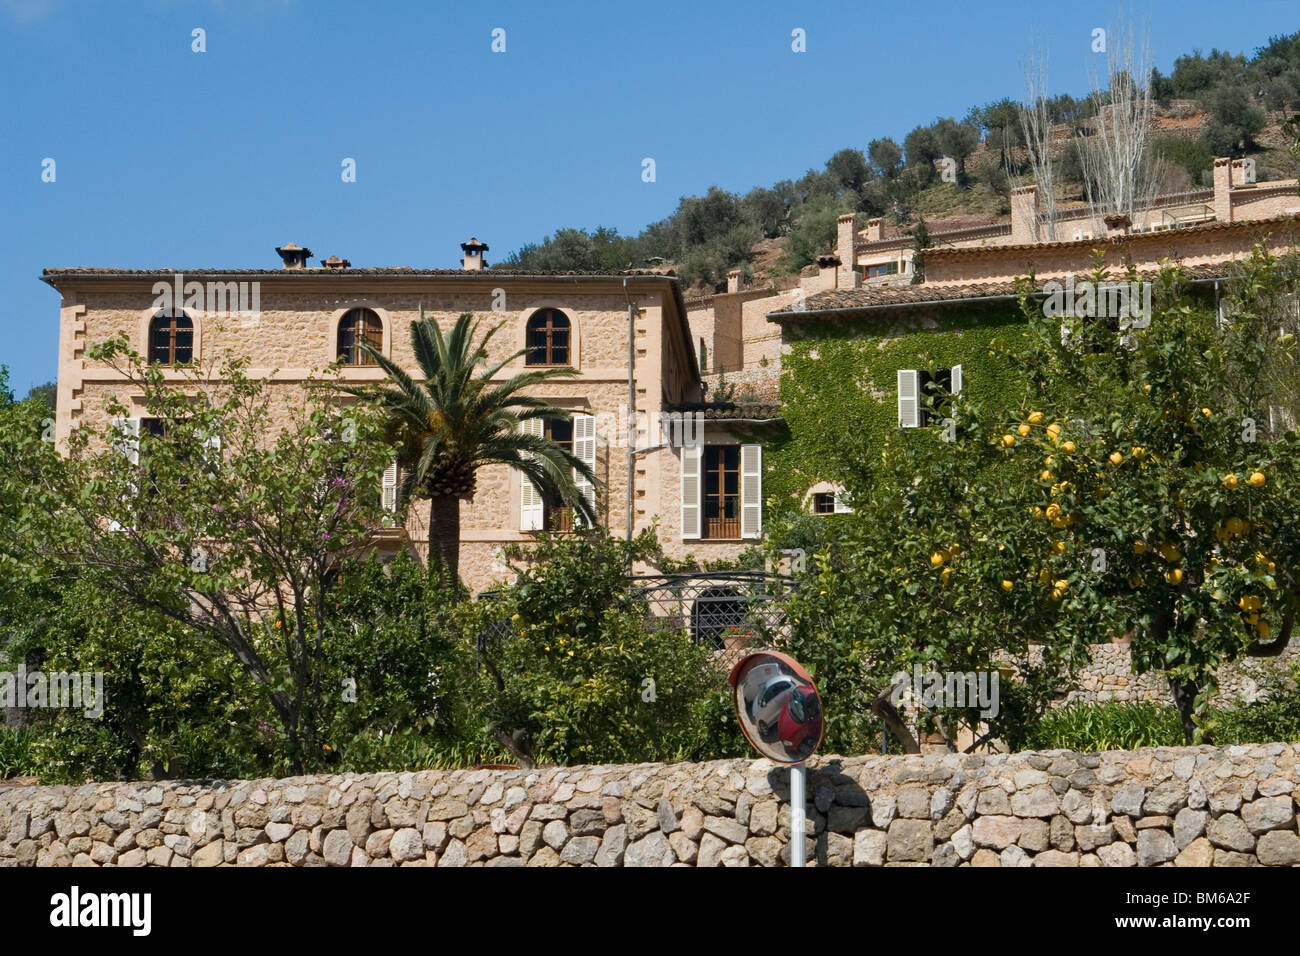 Large impressive houses in Deia (Majorca - Spain) with lemon trees bearing fruit. Maisons bourgeoises à Deia - Stock Image